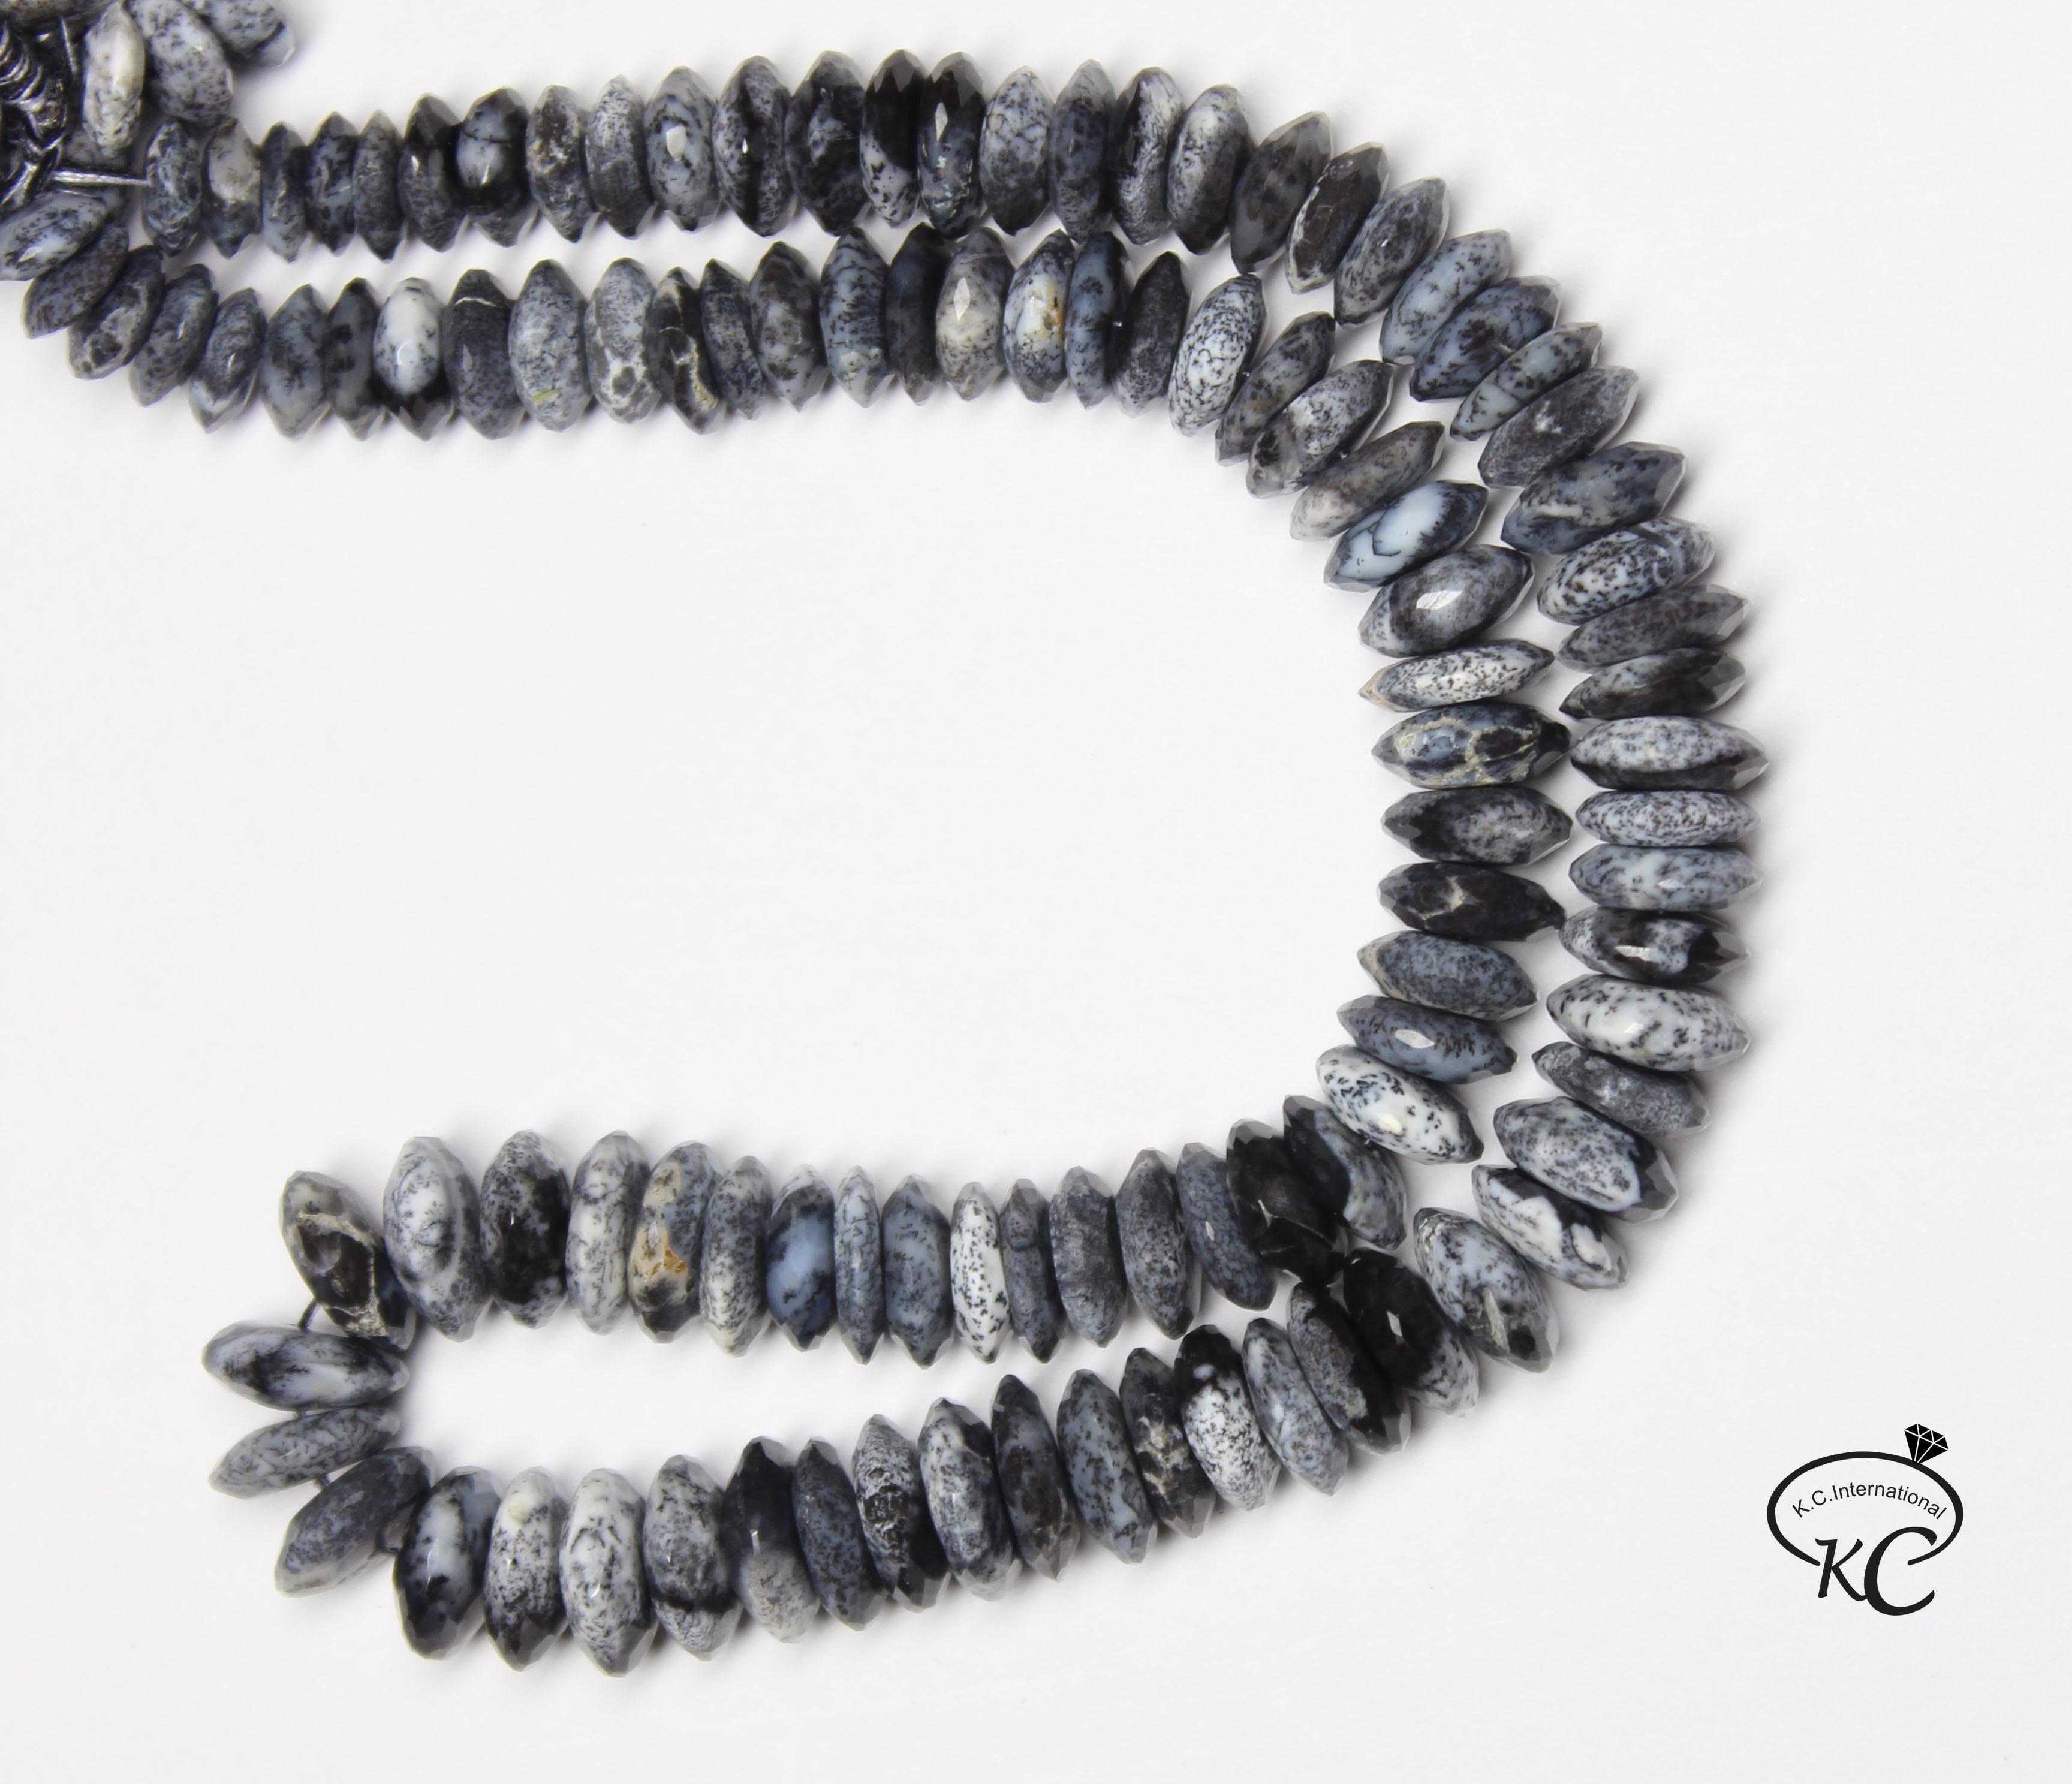 Dendrite Opal German Cut Beads